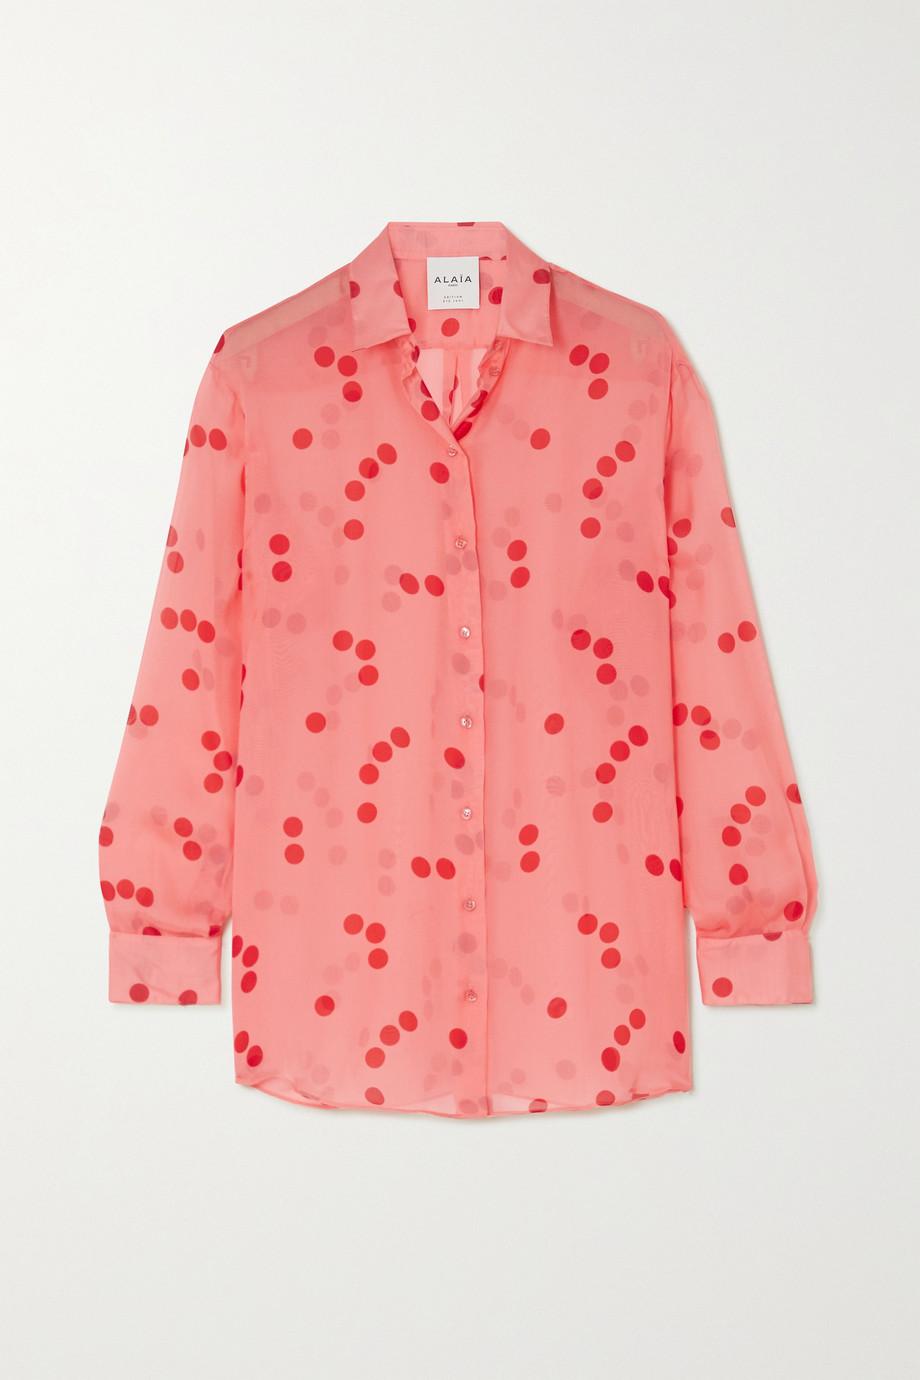 Alaïa Edition polka-dot silk-chiffon blouse